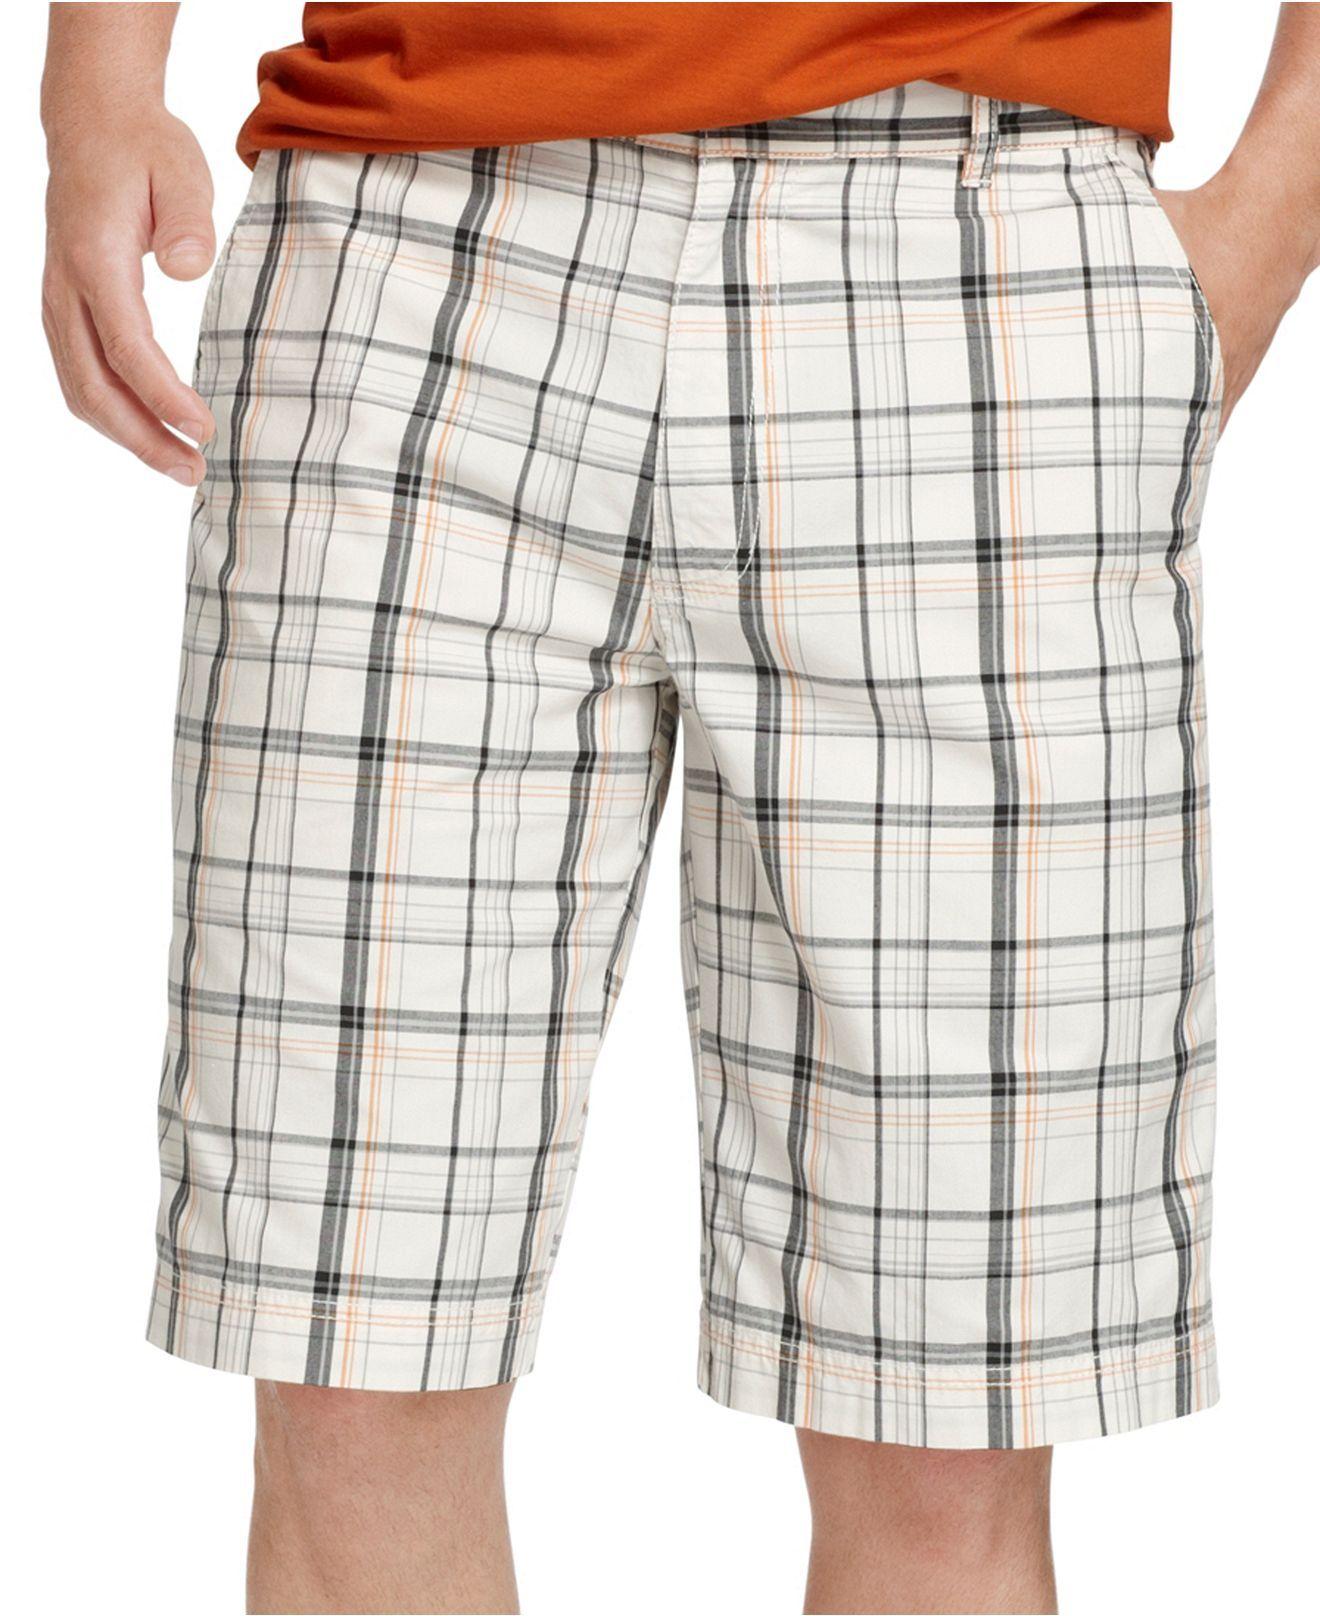 a261d36ca915 So perfect for summer. Izod Shorts